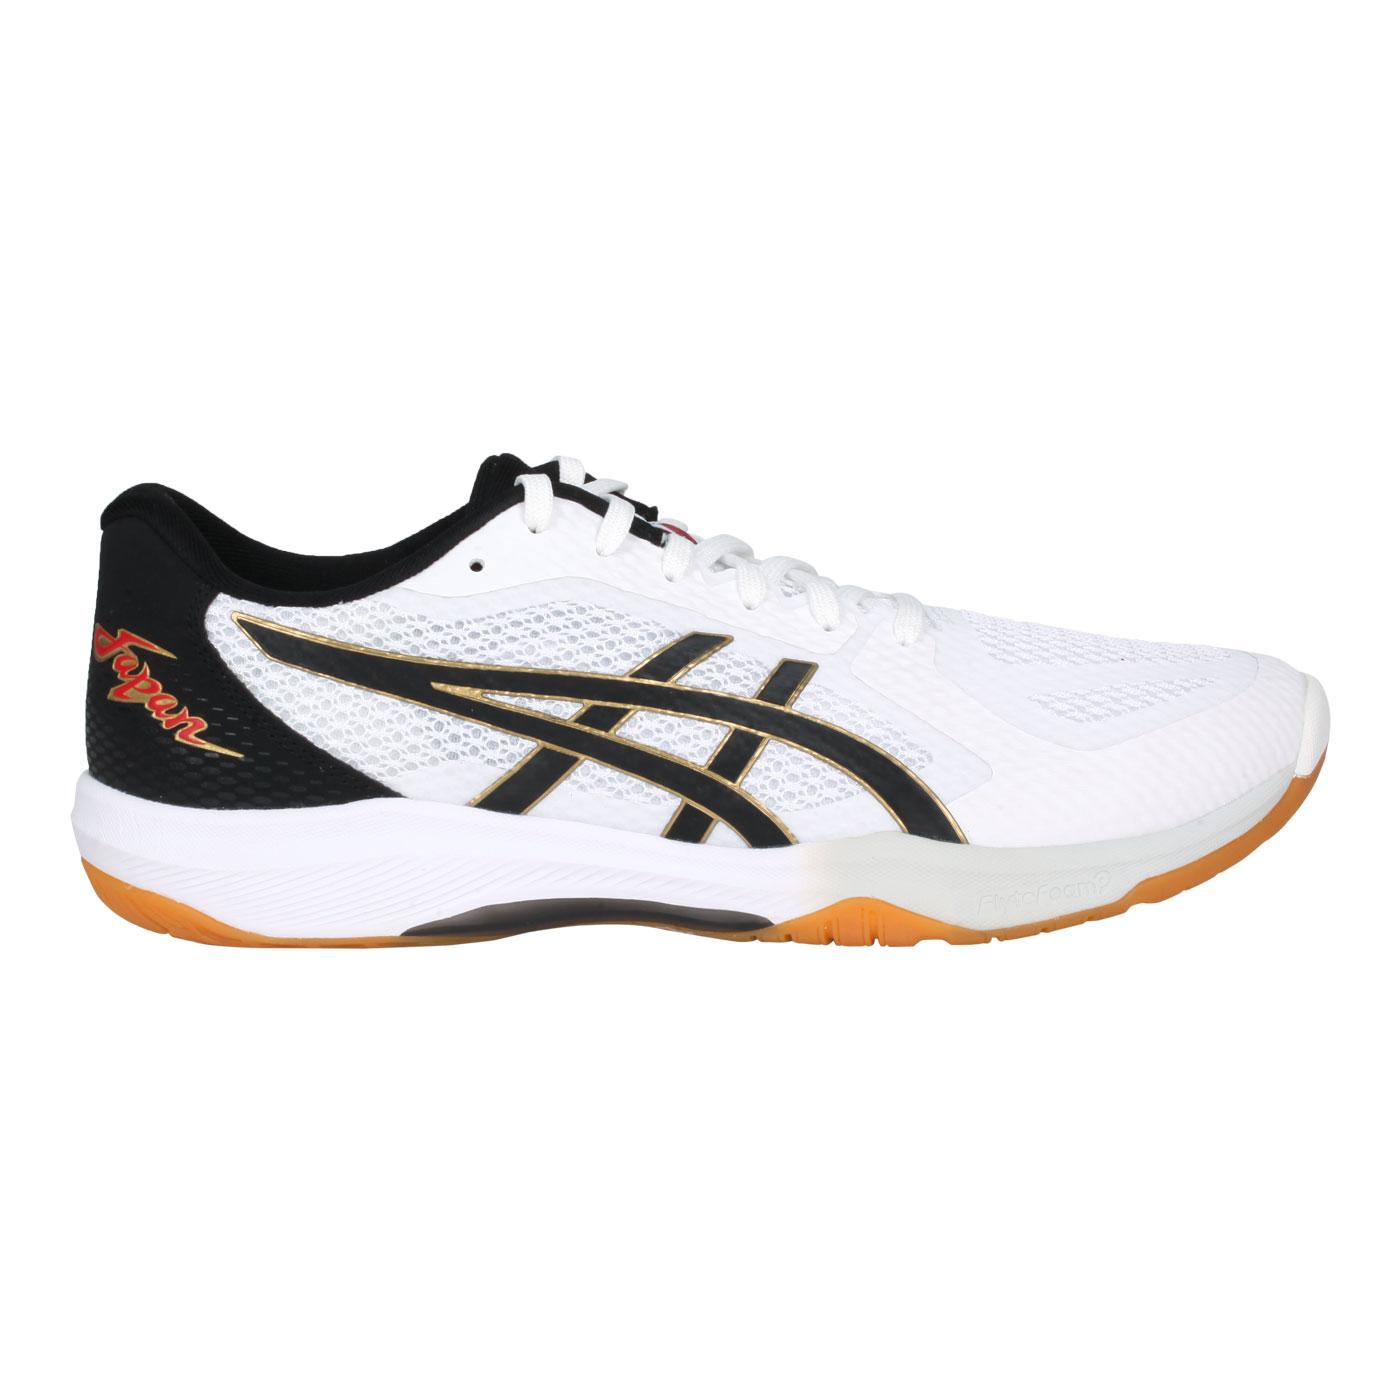 ASICS 男款排羽球鞋  @ROTE JAPAN LYTE FF 2@1053A028-103